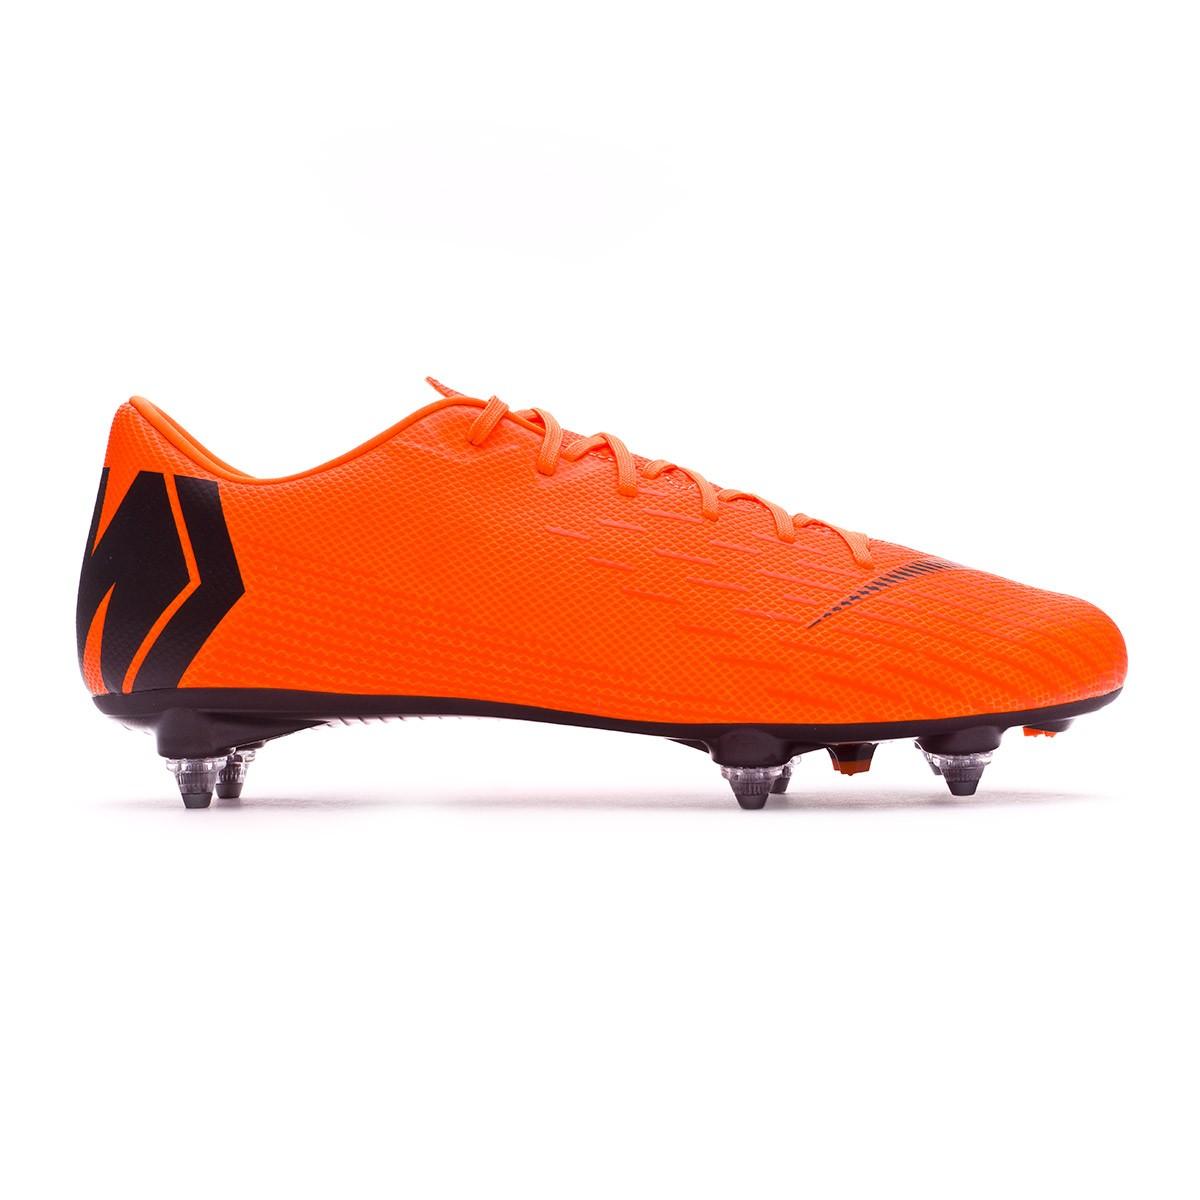 c4b17b06fea Football Boots Nike Mercurial Vapor XII Academy SG-Pro Total  orange-Black-Volt - Football store Fútbol Emotion